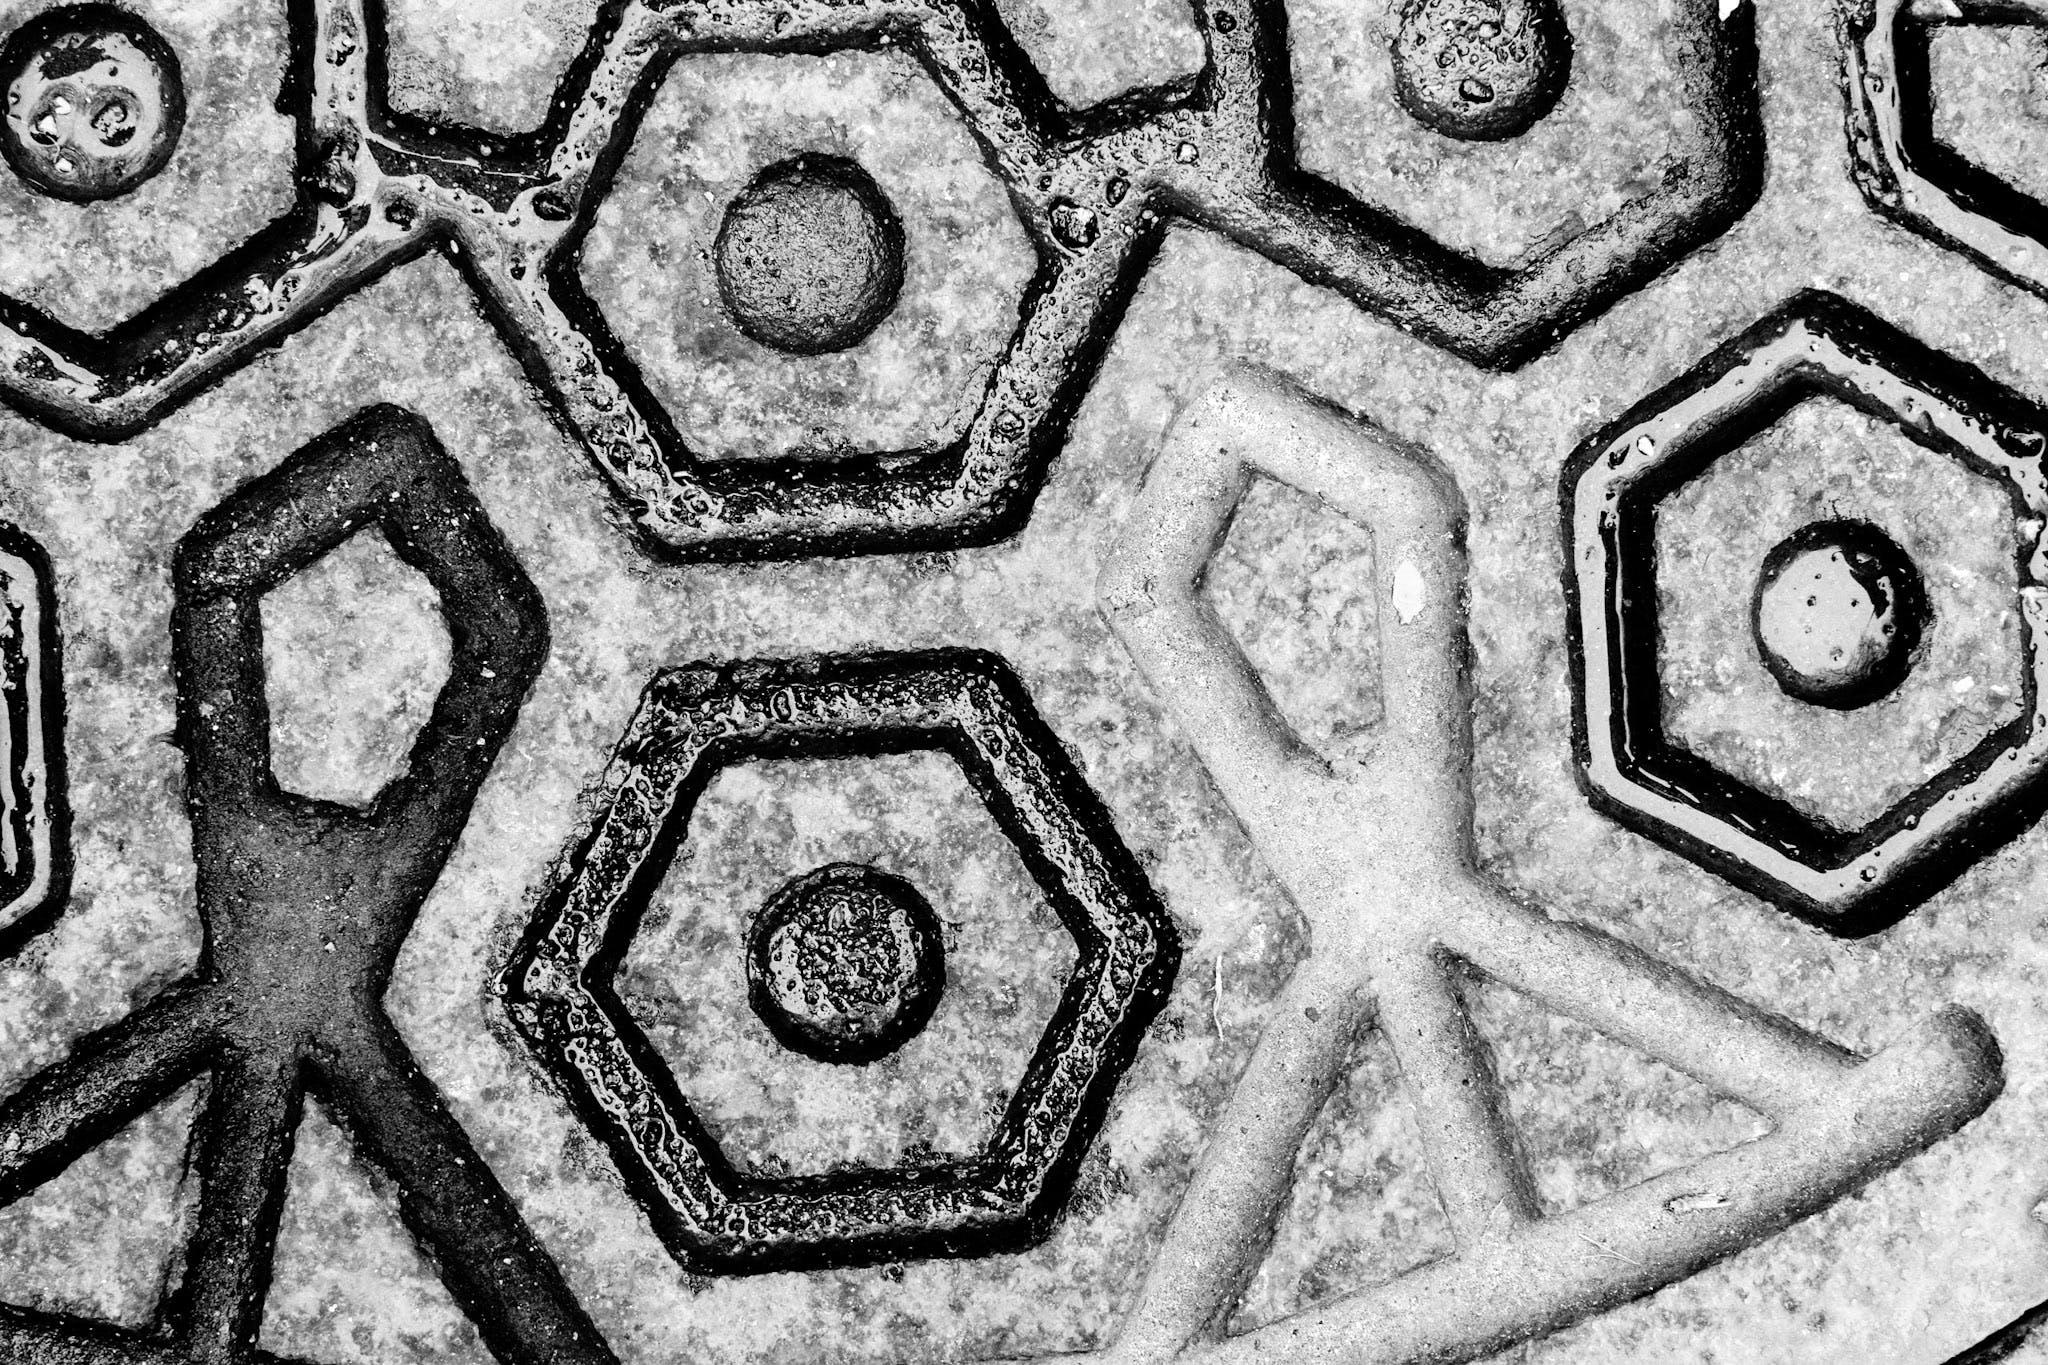 Free stock photo of concrete, monochrome photography, mosaic pattern